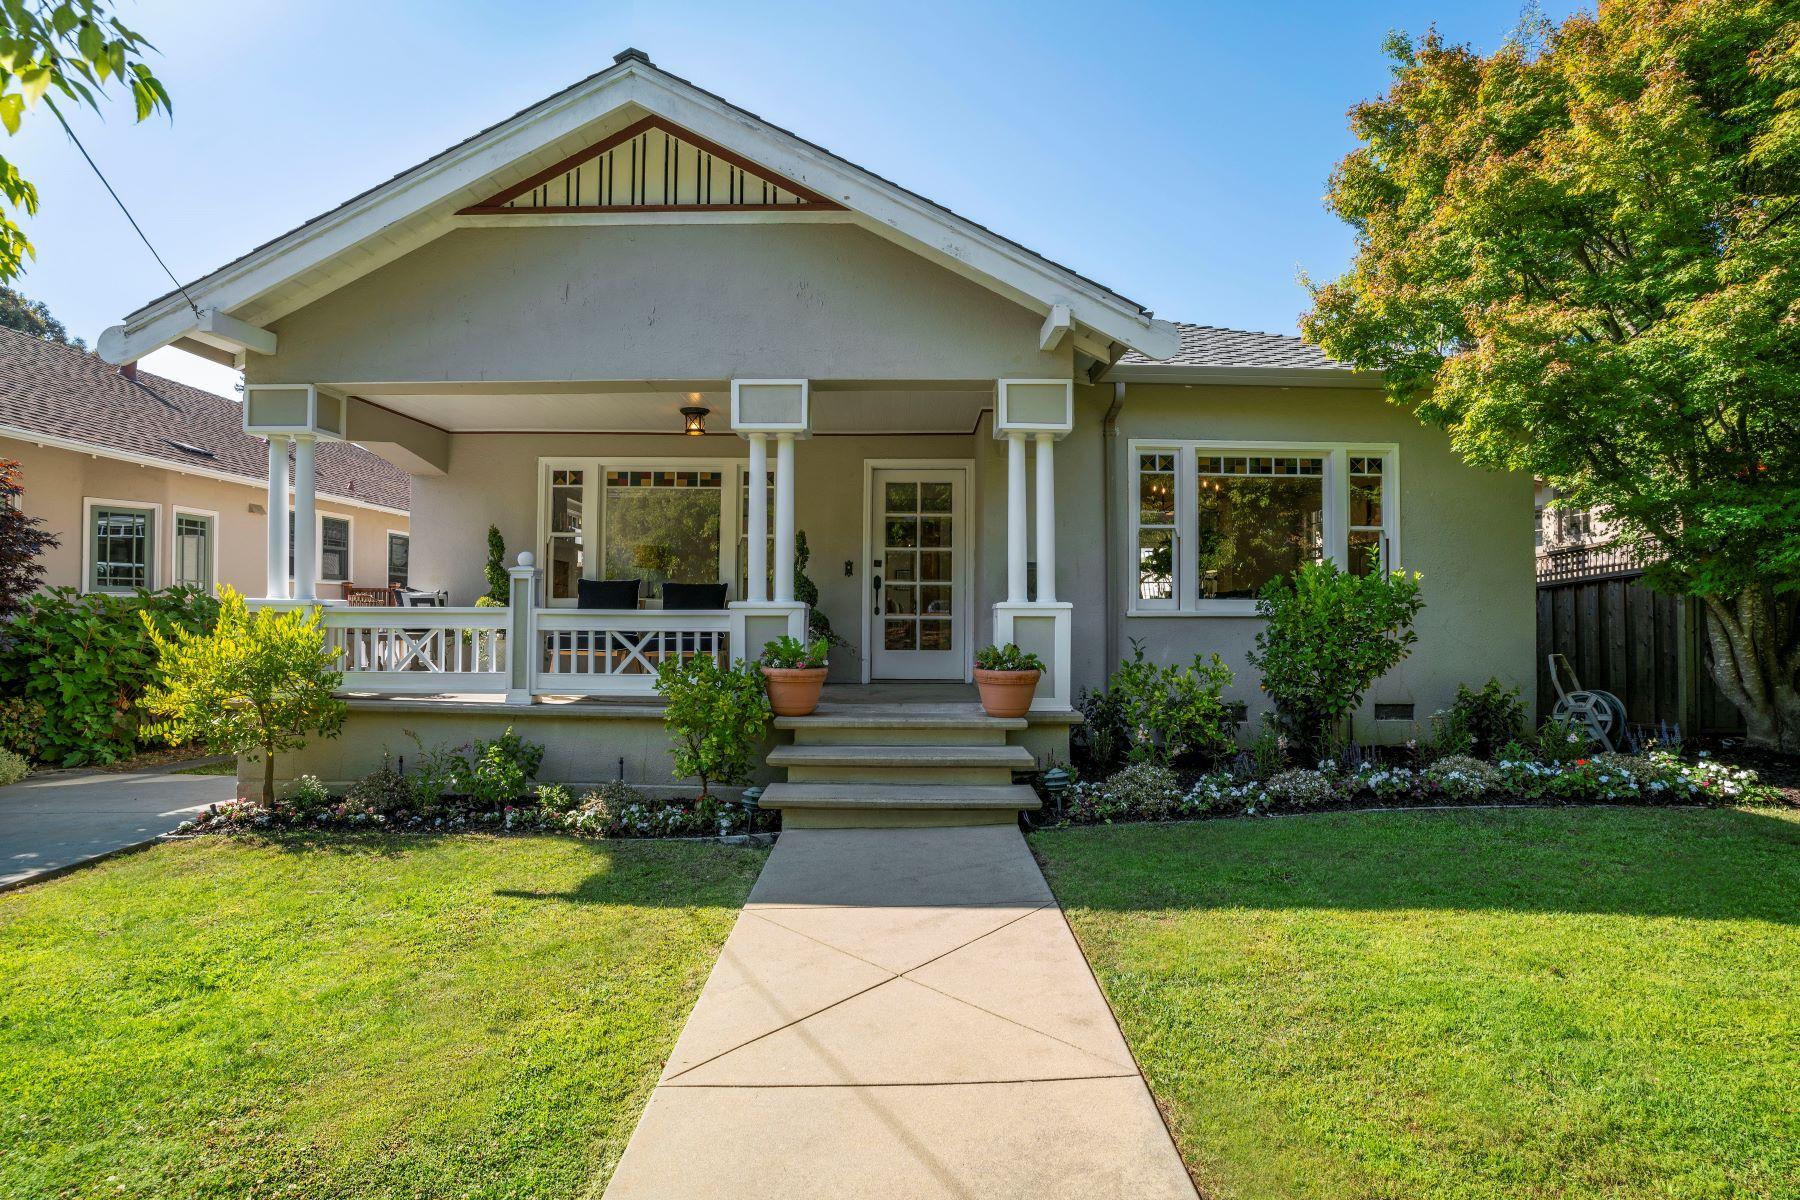 Single Family Homes 为 销售 在 Charming Bungalow in San Mateo Park 166 Warren Road 圣马特奥市, 加利福尼亚州 94401 美国